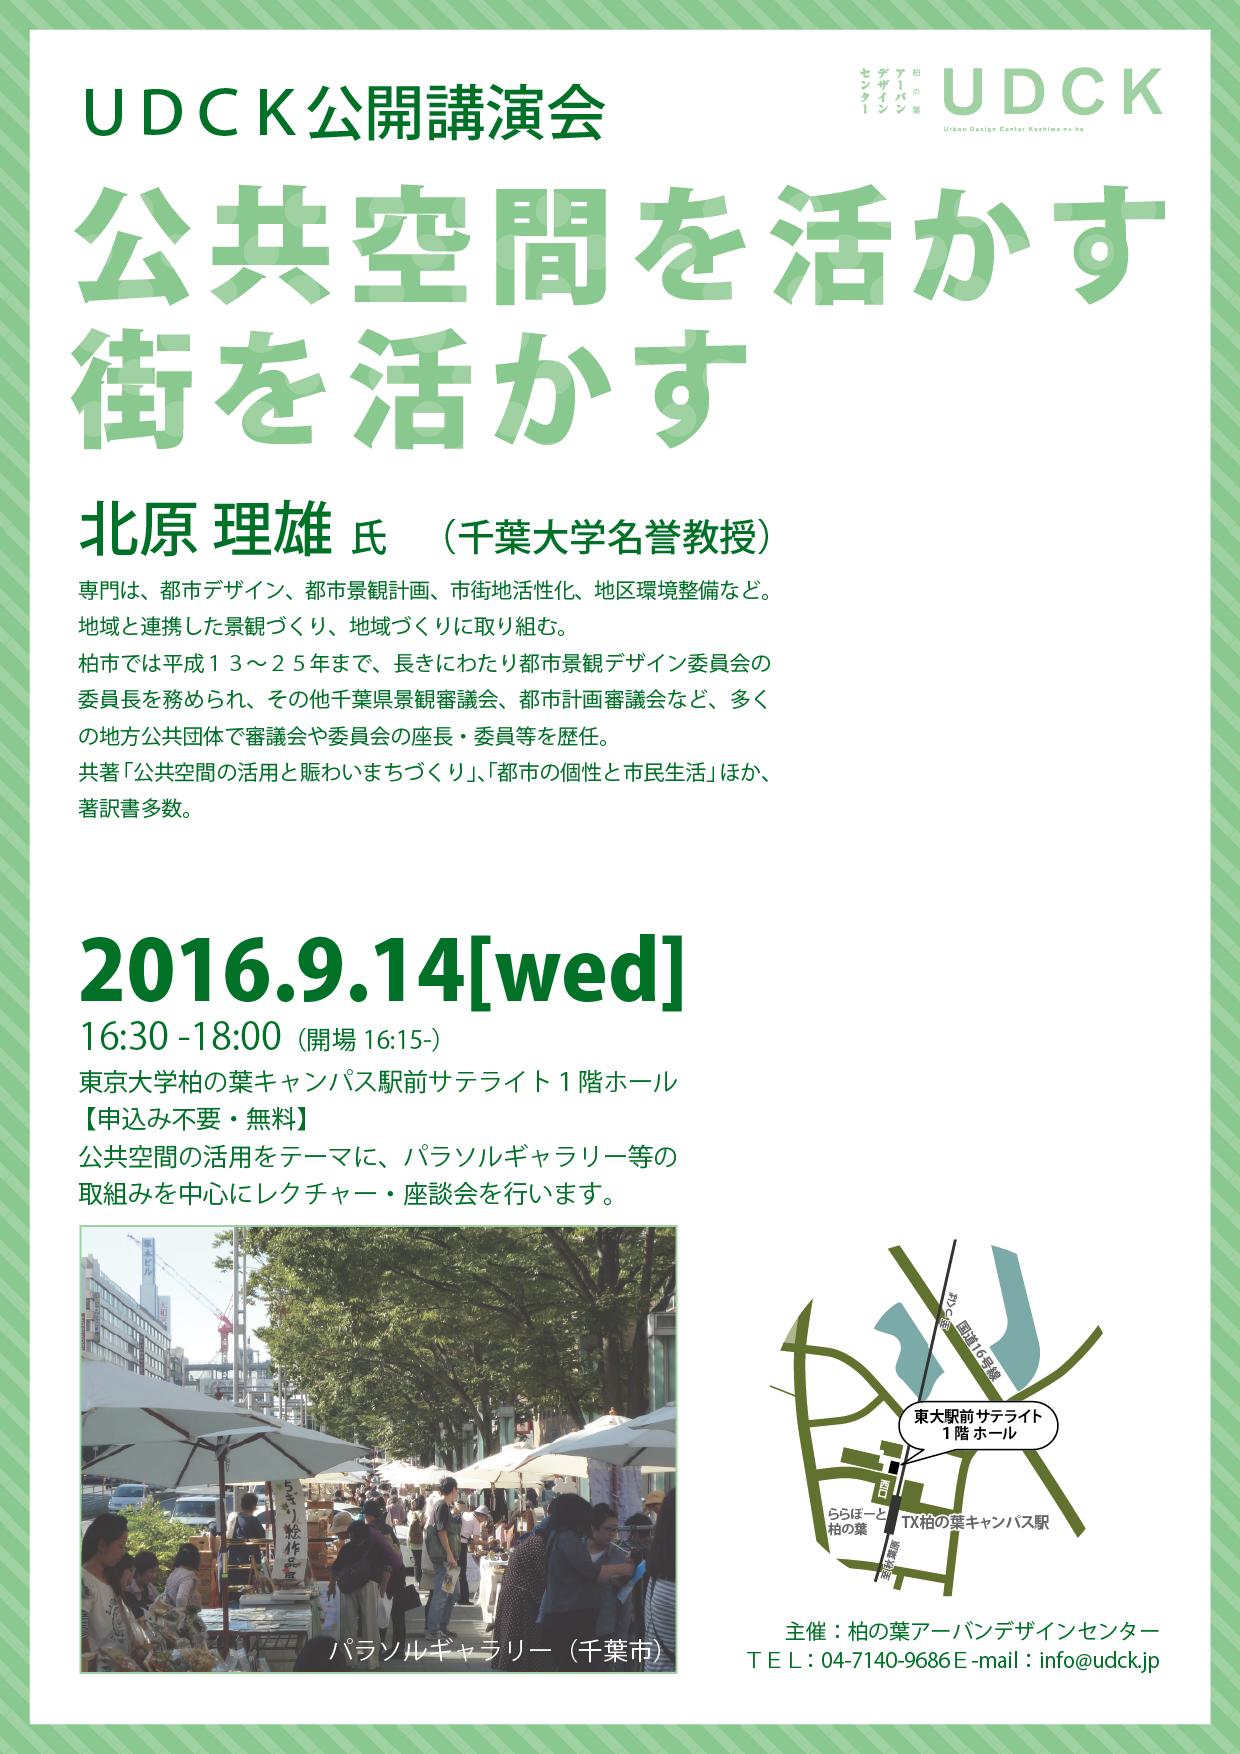 http://www.udck.jp/event/kitahara01.png